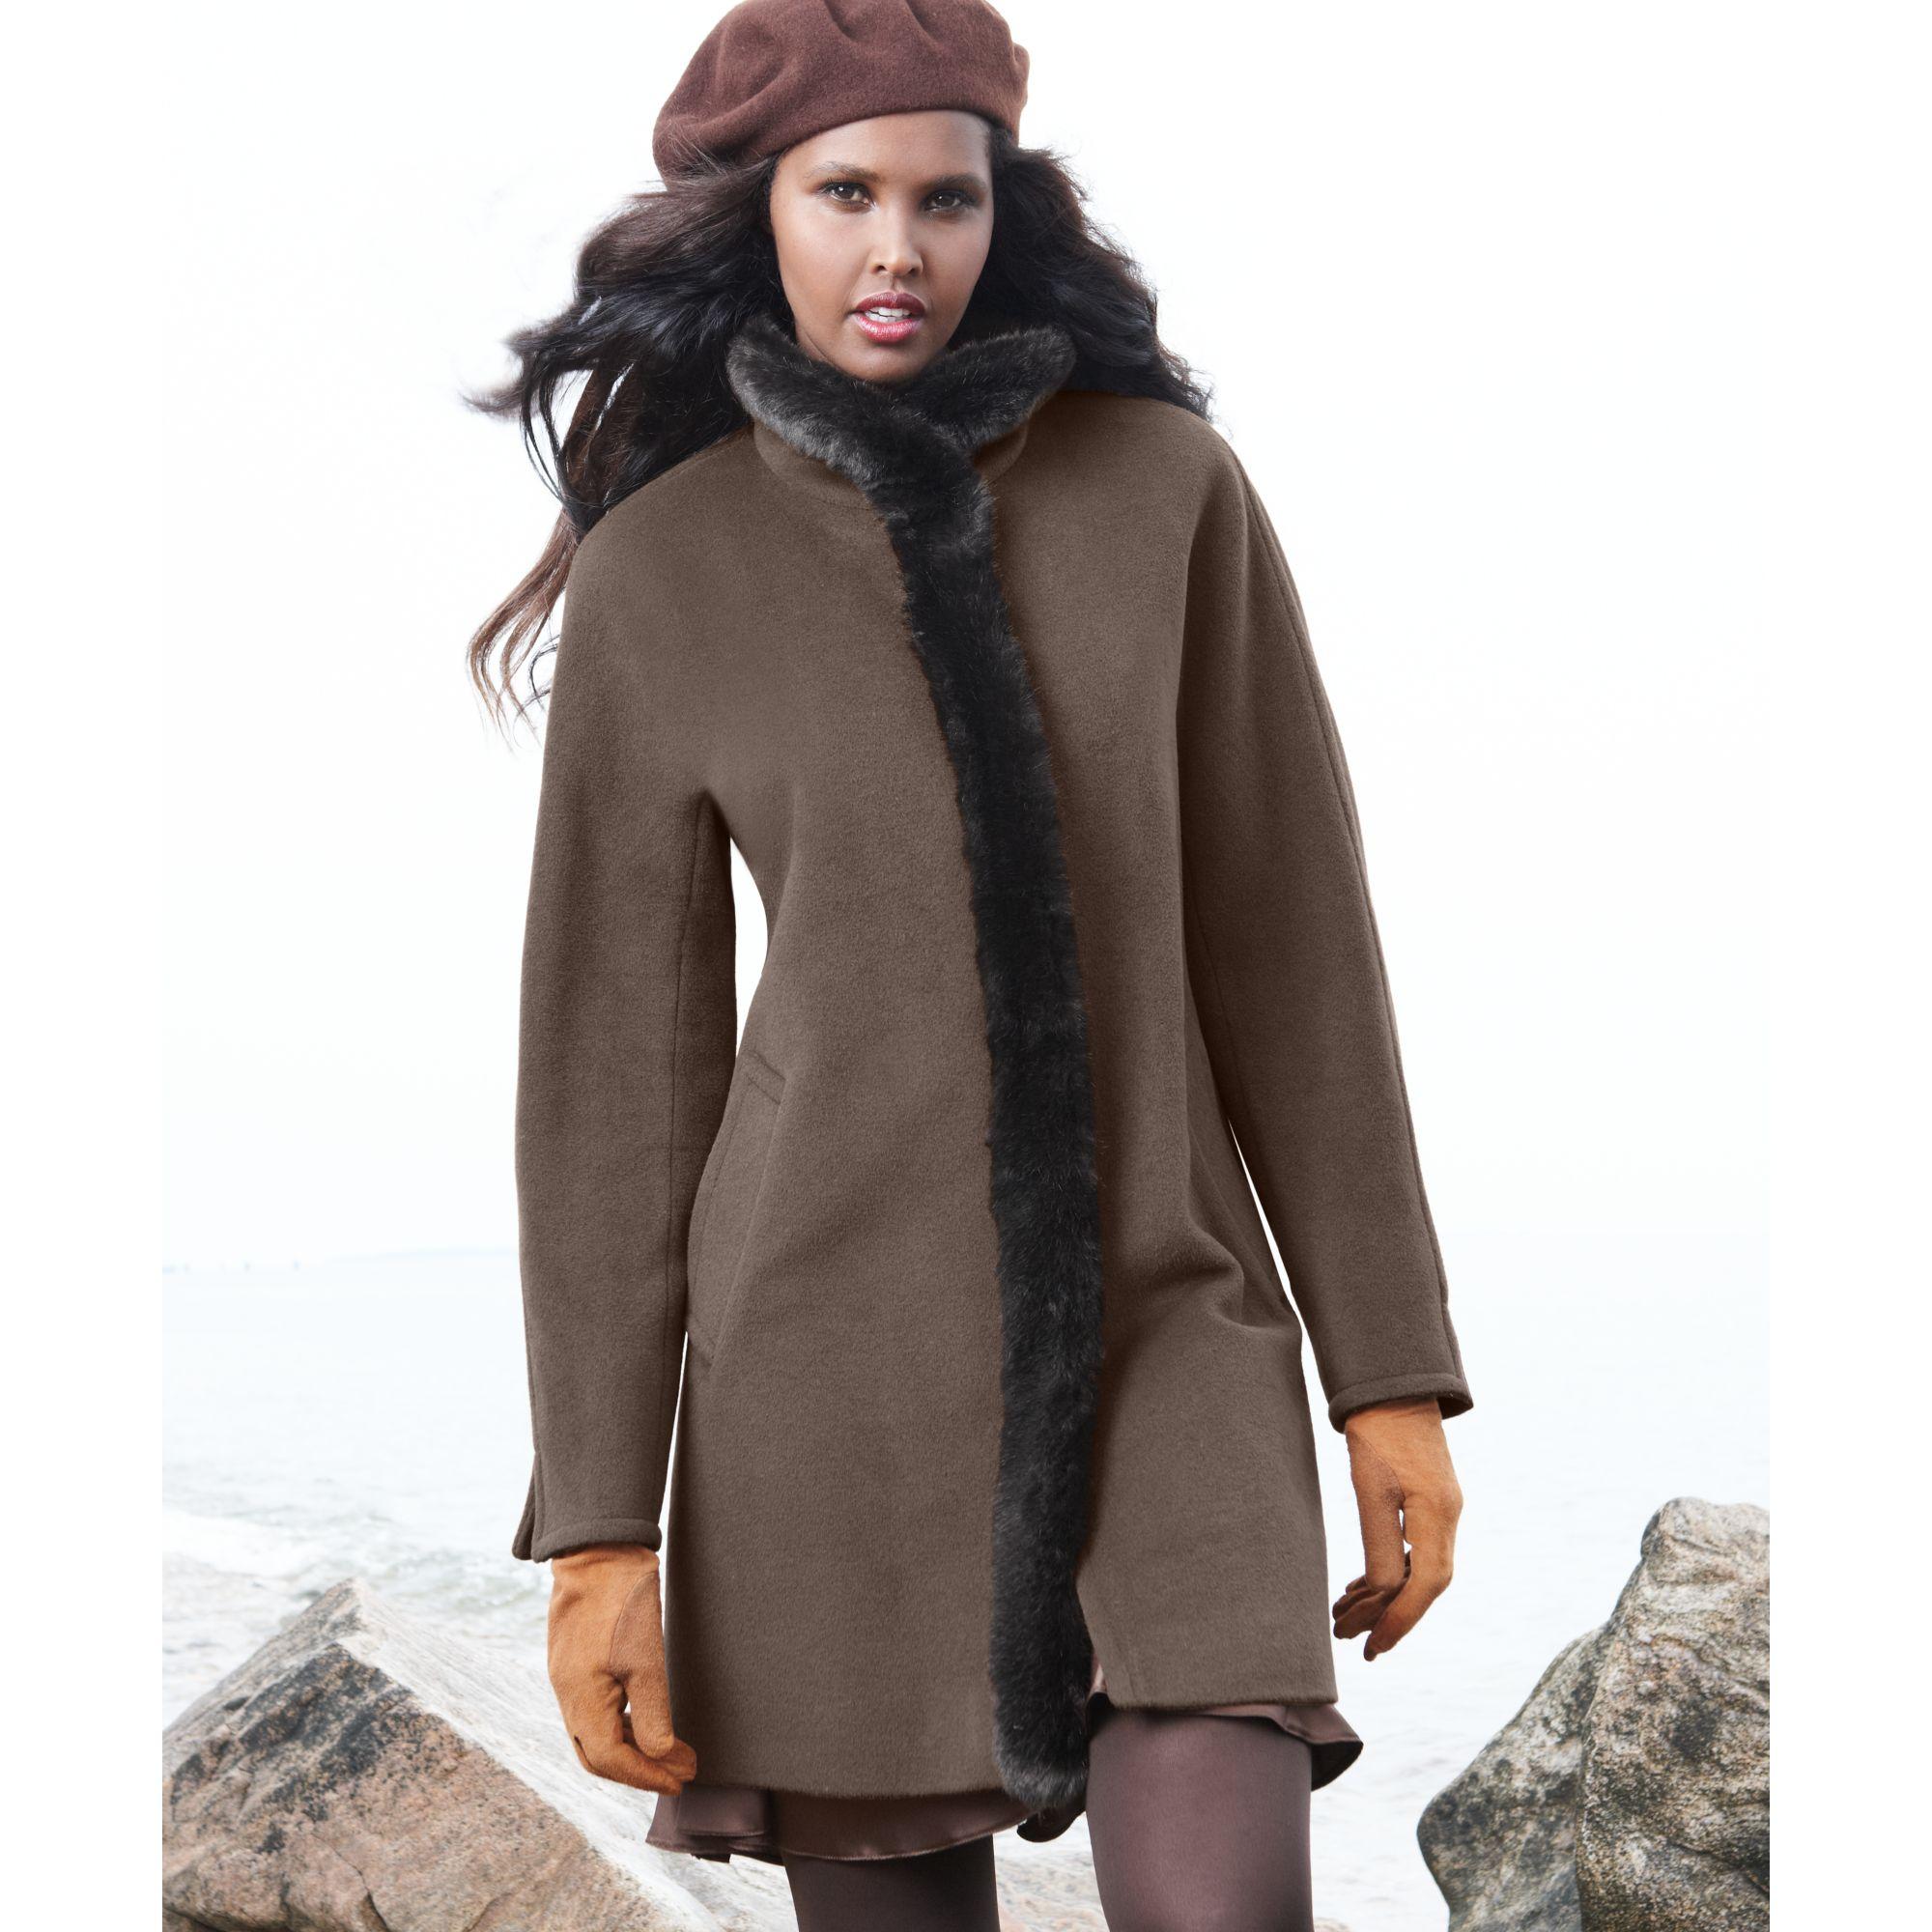 4206104a788a Lyst - Ellen Tracy Faux Fur Trim Wool Blend Car Coat in Brown